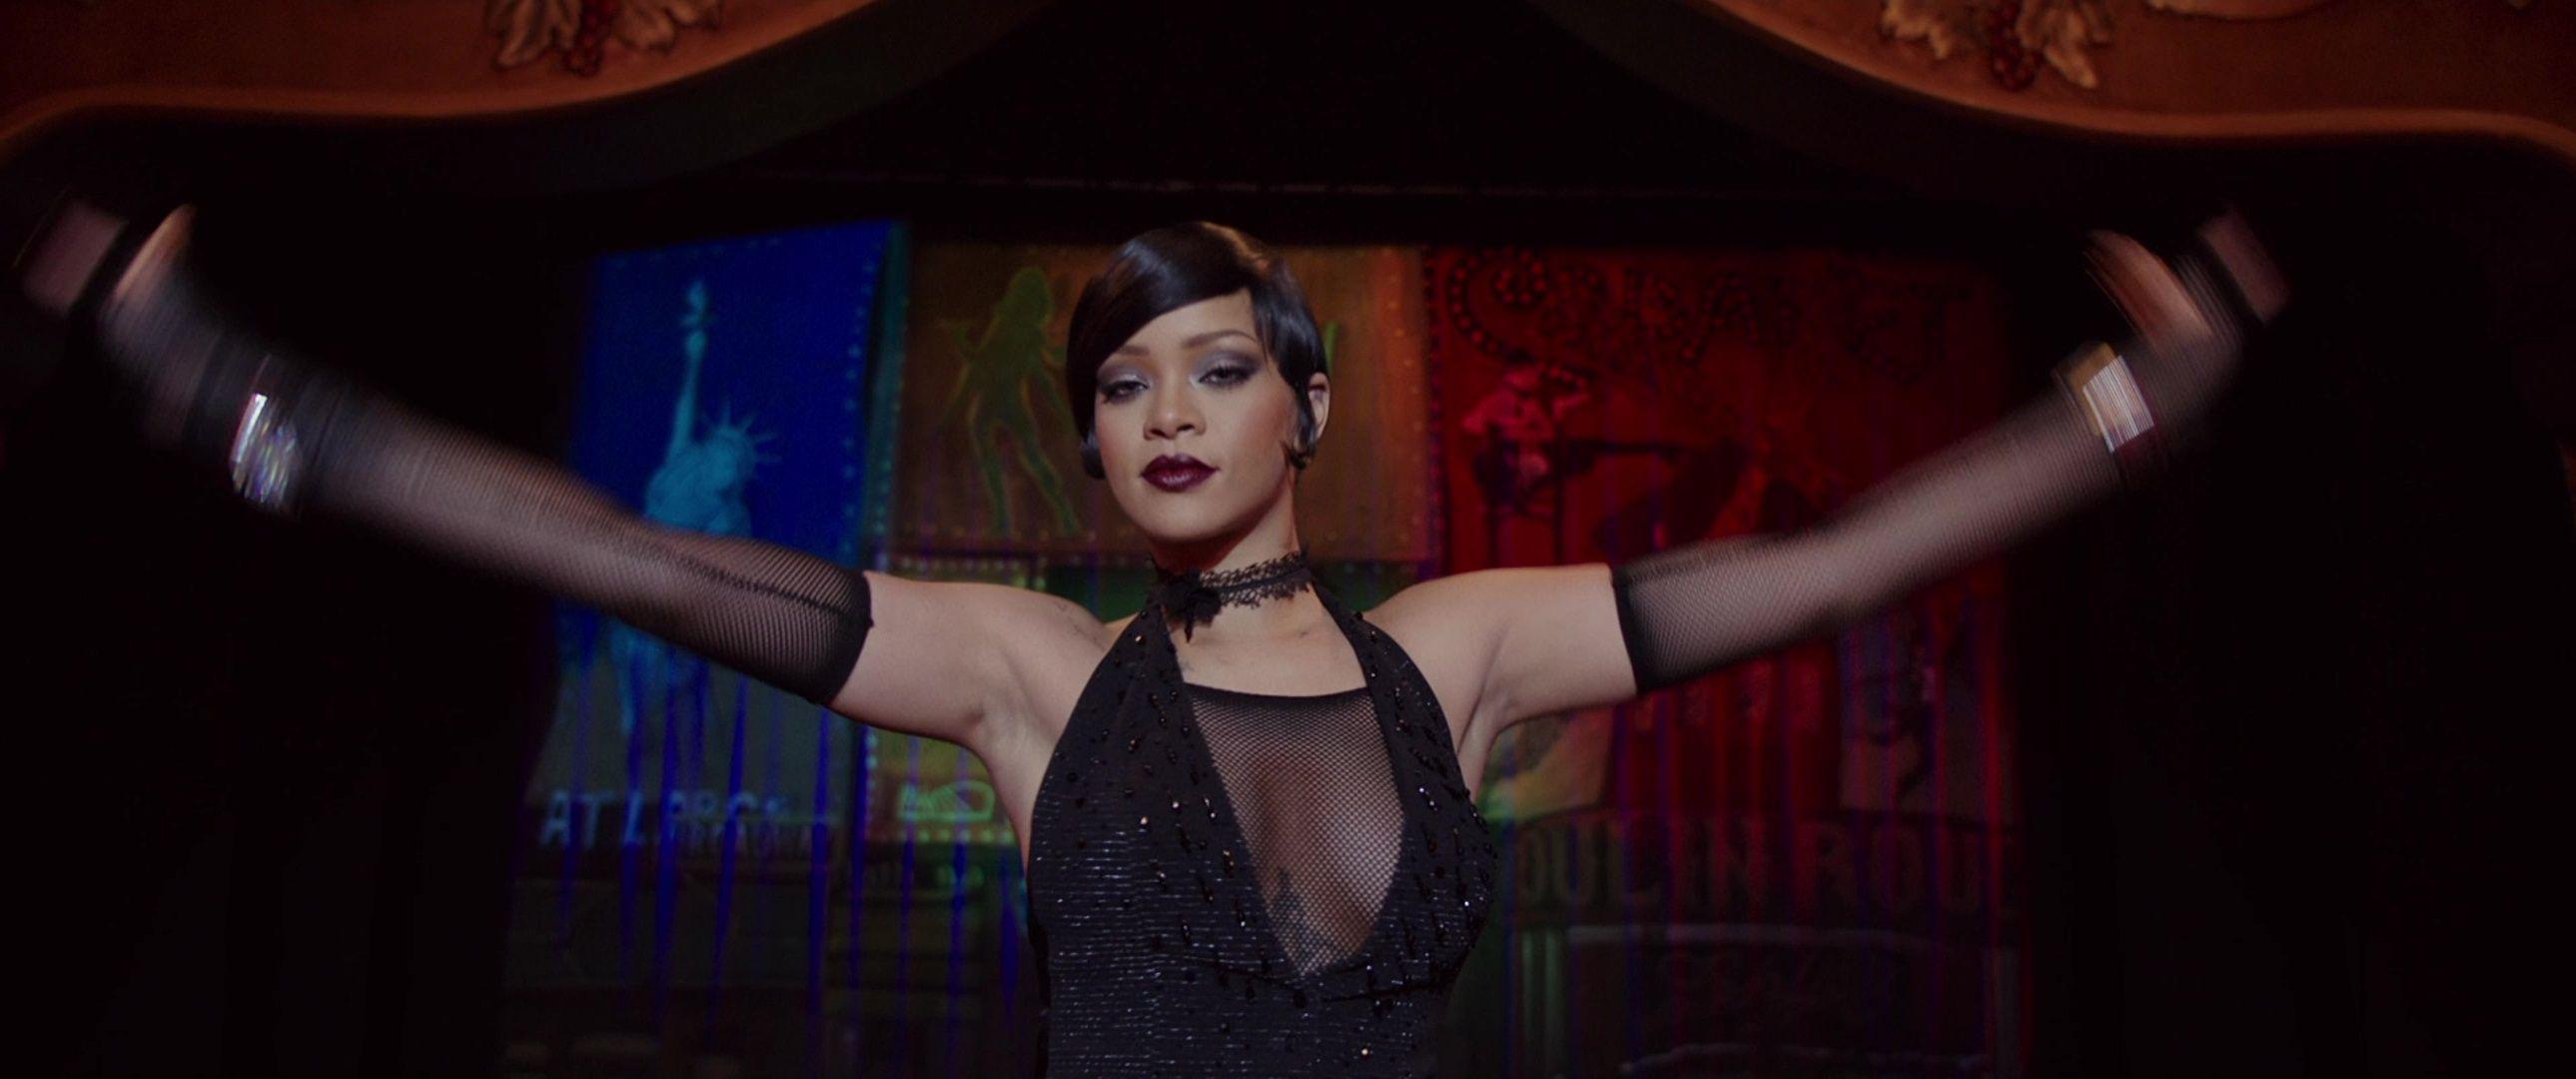 Rihanna-Sexy-71-thefappeningblog.com_.jpg